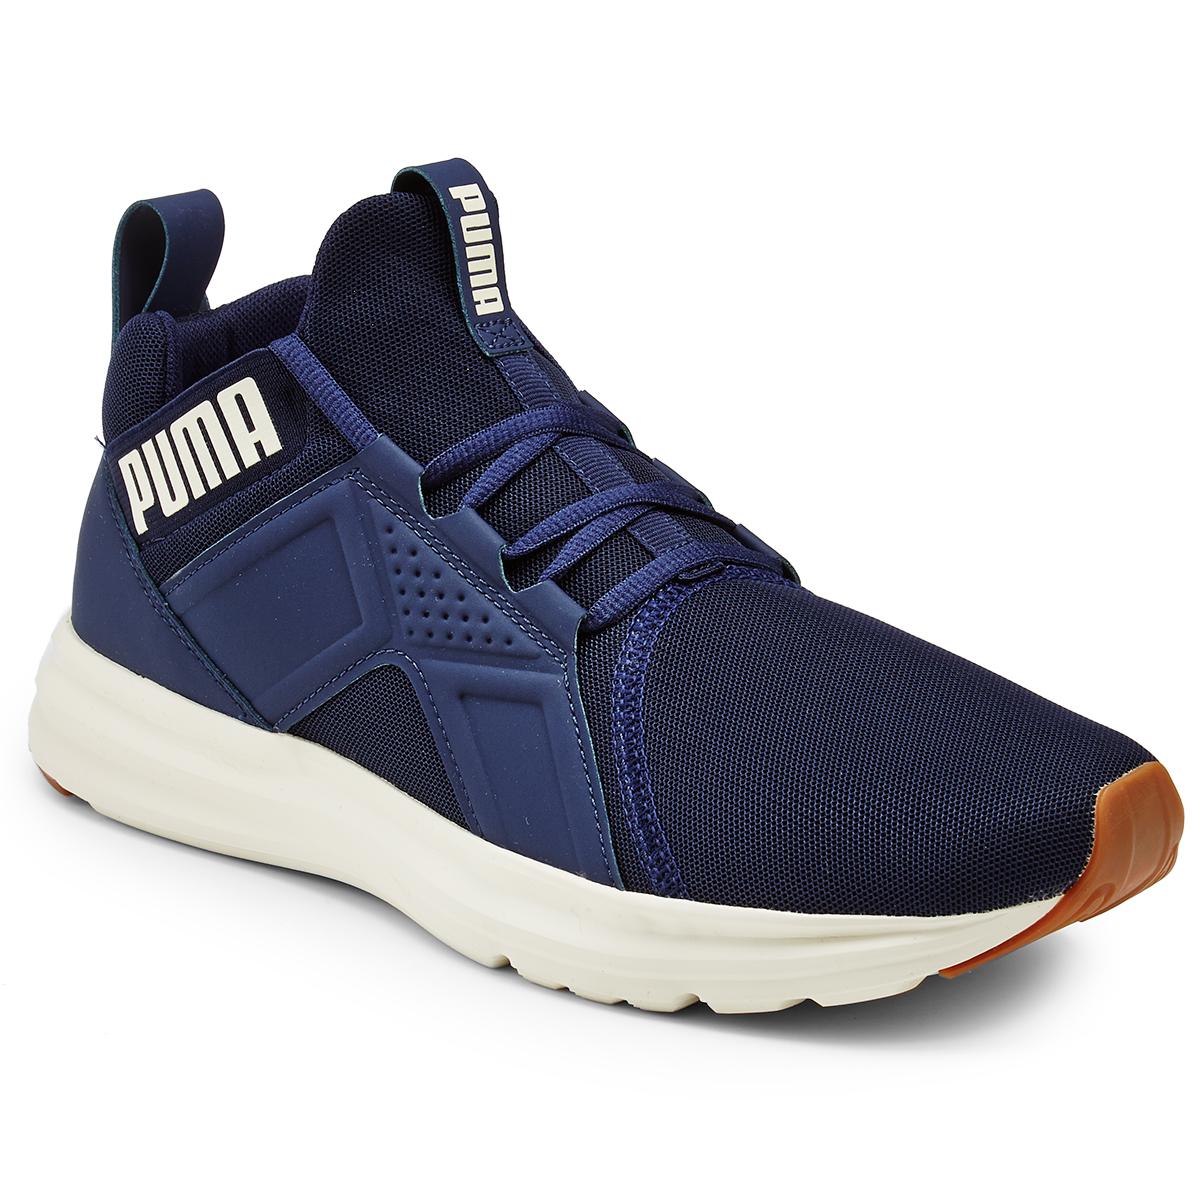 Puma Men's Enzo Running Shoes - Blue, 9.5